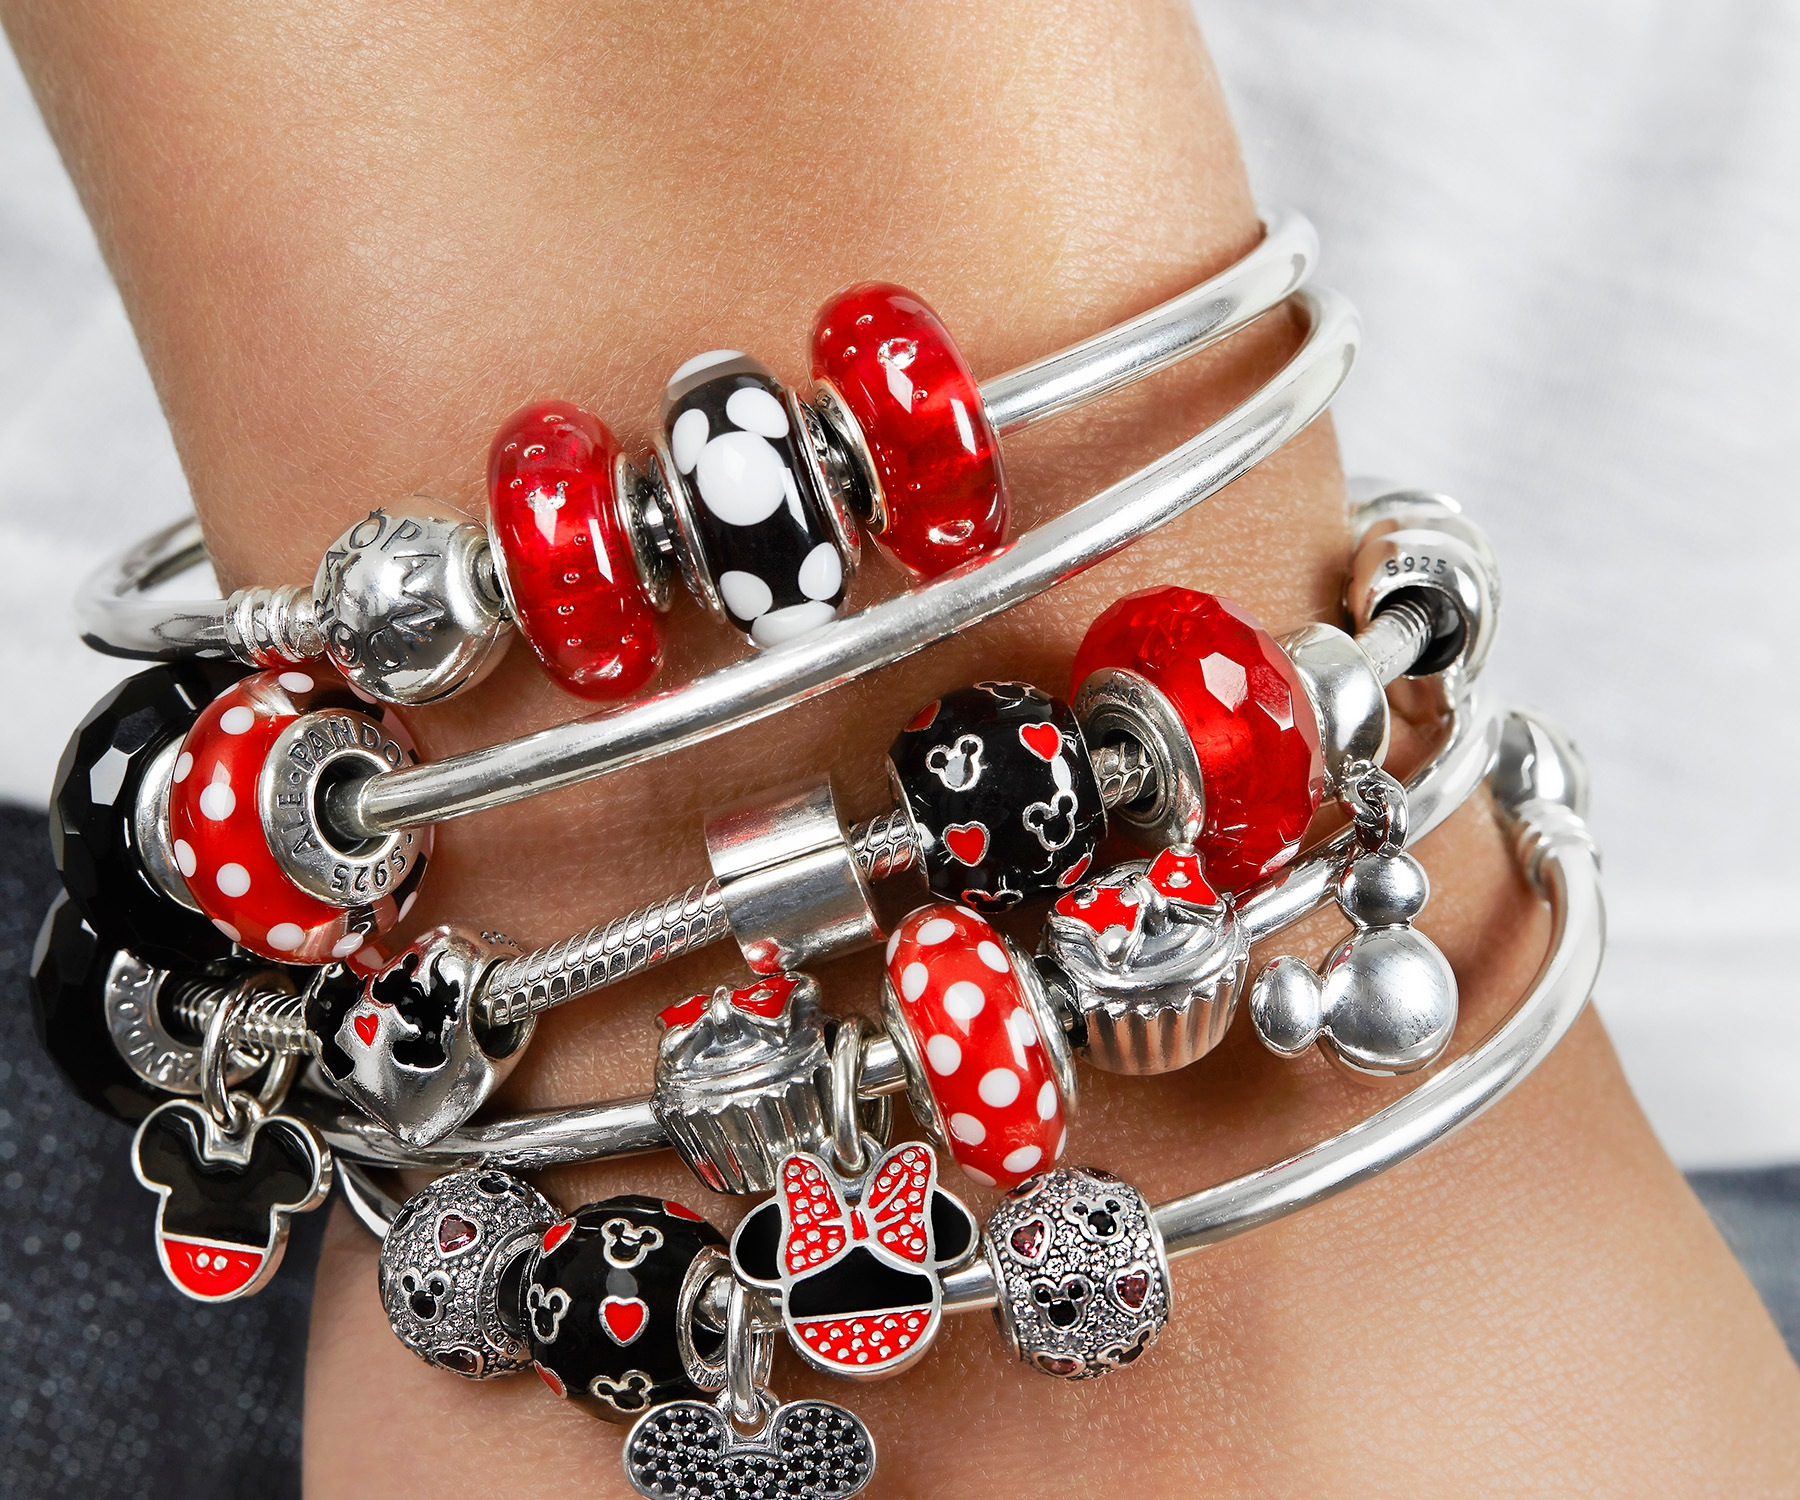 Pandora Jewelry Orlando: PANDORA Jewelry's New Disney-Themed Collection Celebrates